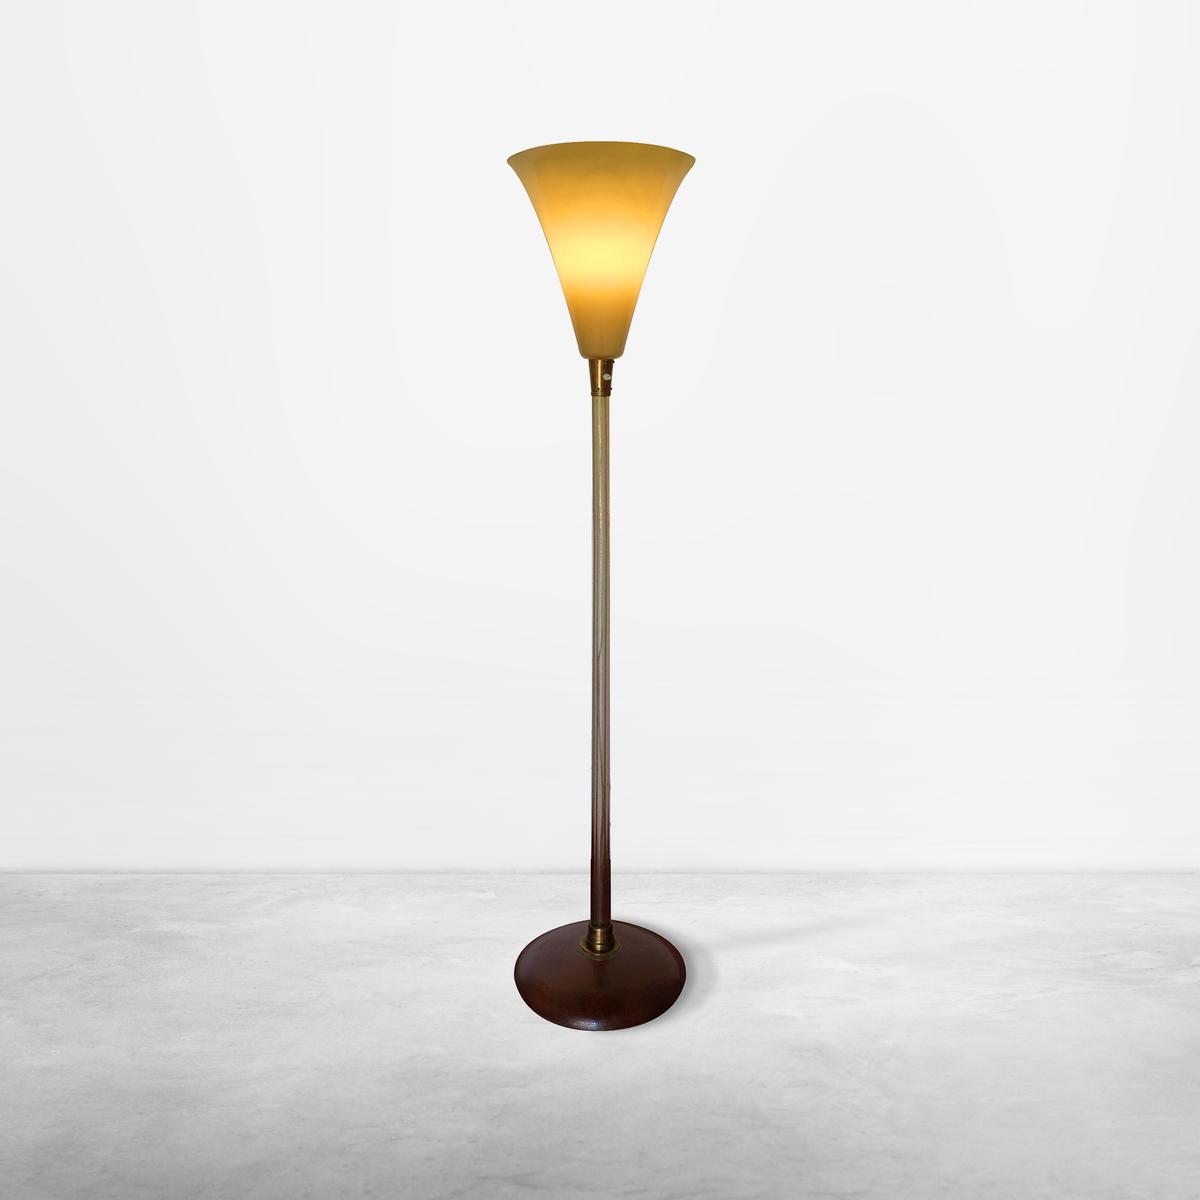 Tomaso Buzzi for Venini Murano, Italian Mid-Century Glass Floor Lamp, 1933